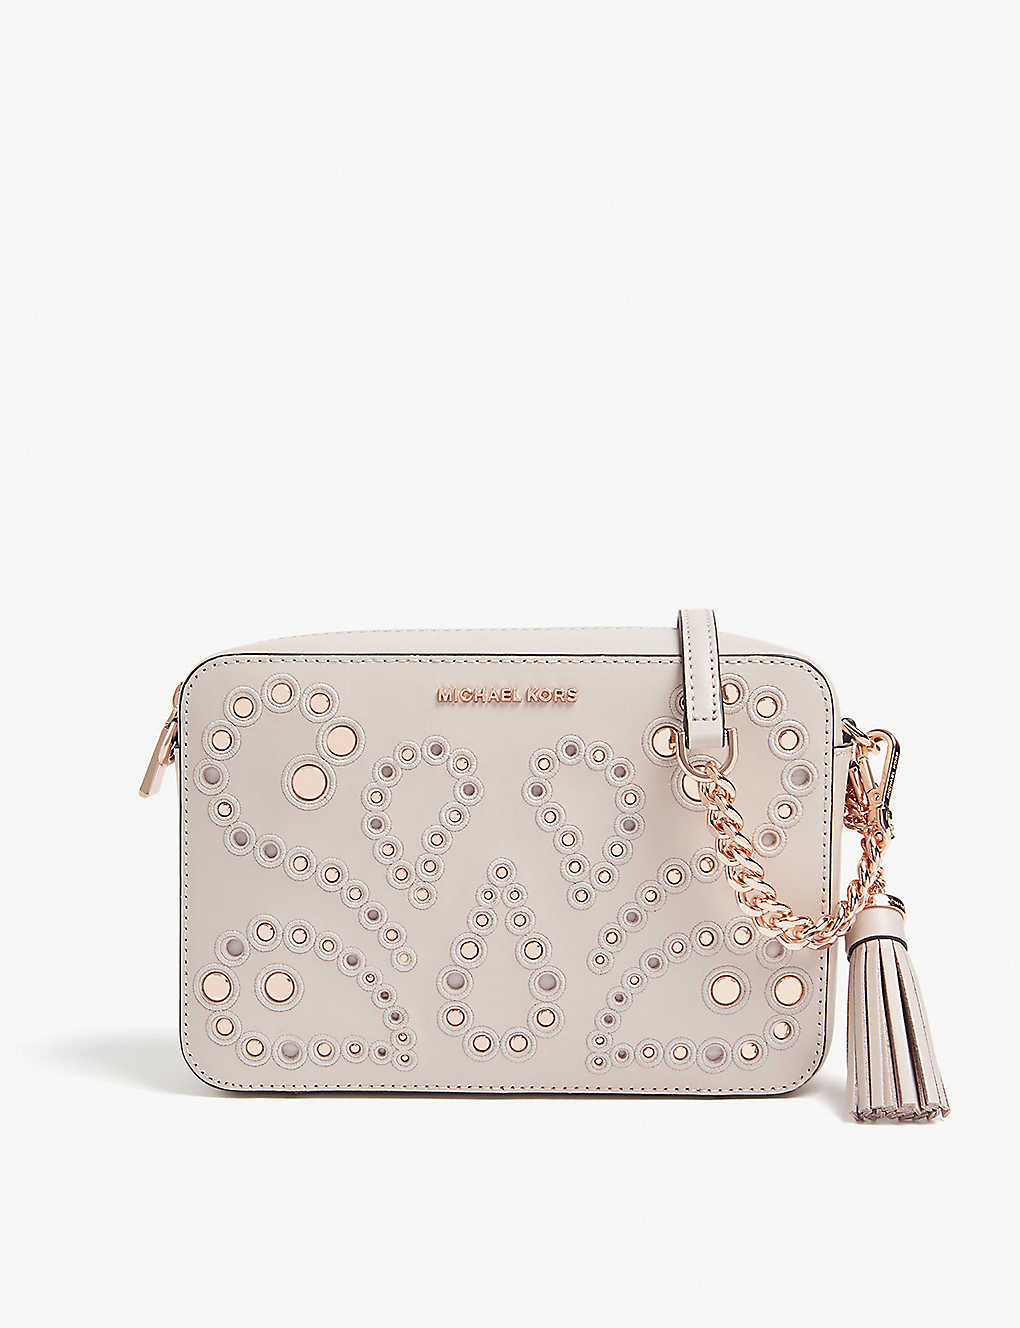 3b9295174be7 MICHAEL MICHAEL KORS - Embellished leather cross-body bag ...